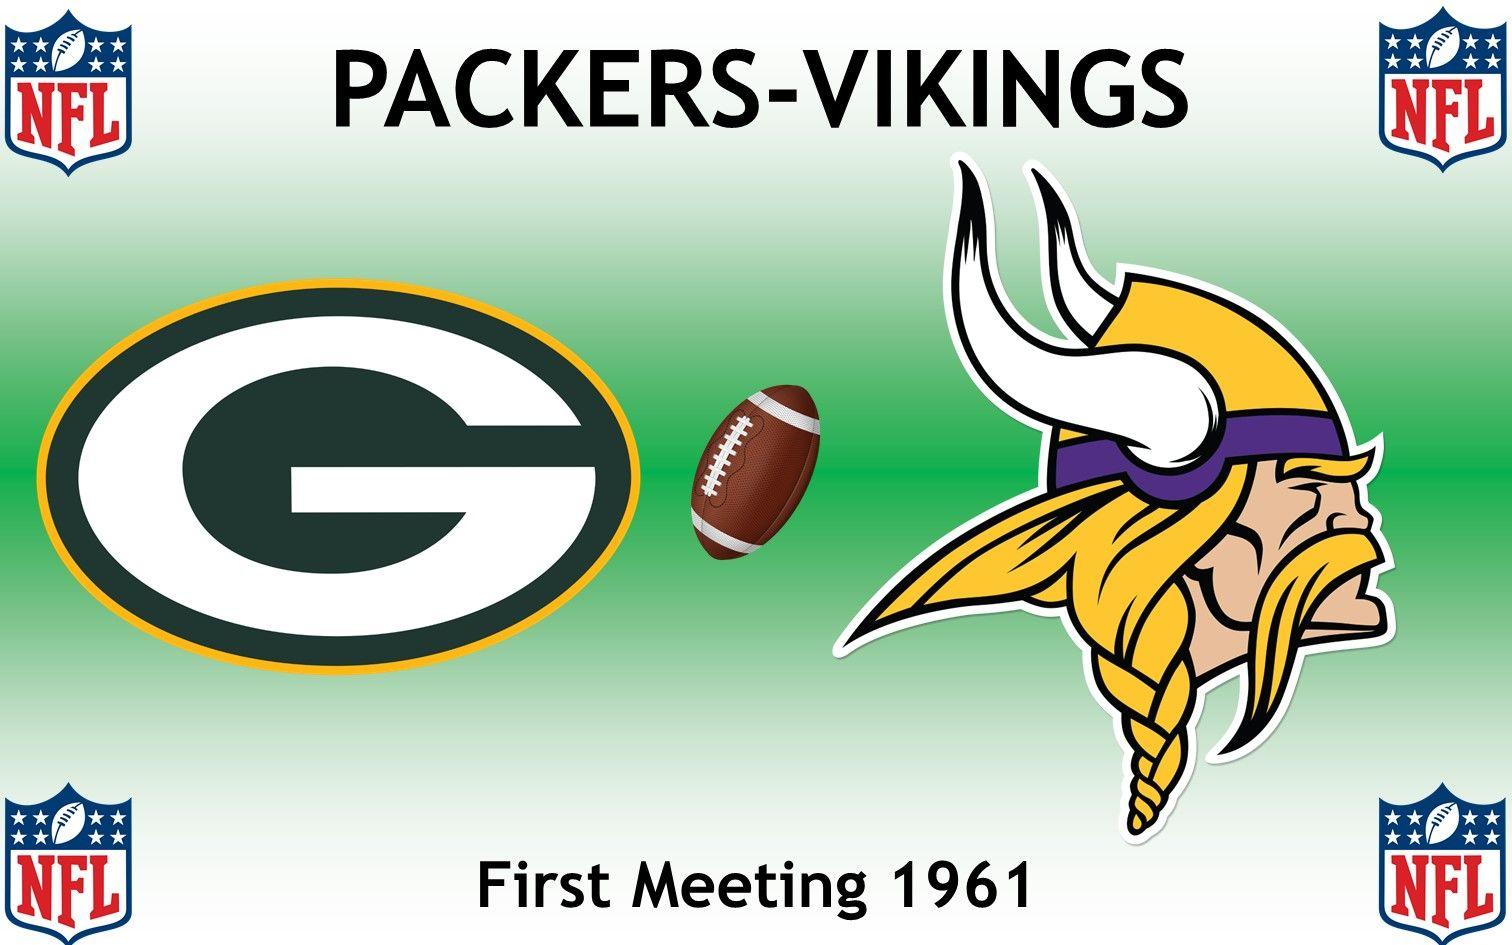 1961 National Football League 1st Packers Vikings Green Bay Packers Minnesota Vikings Packers Football Rivalries National Football League Nfl Packers